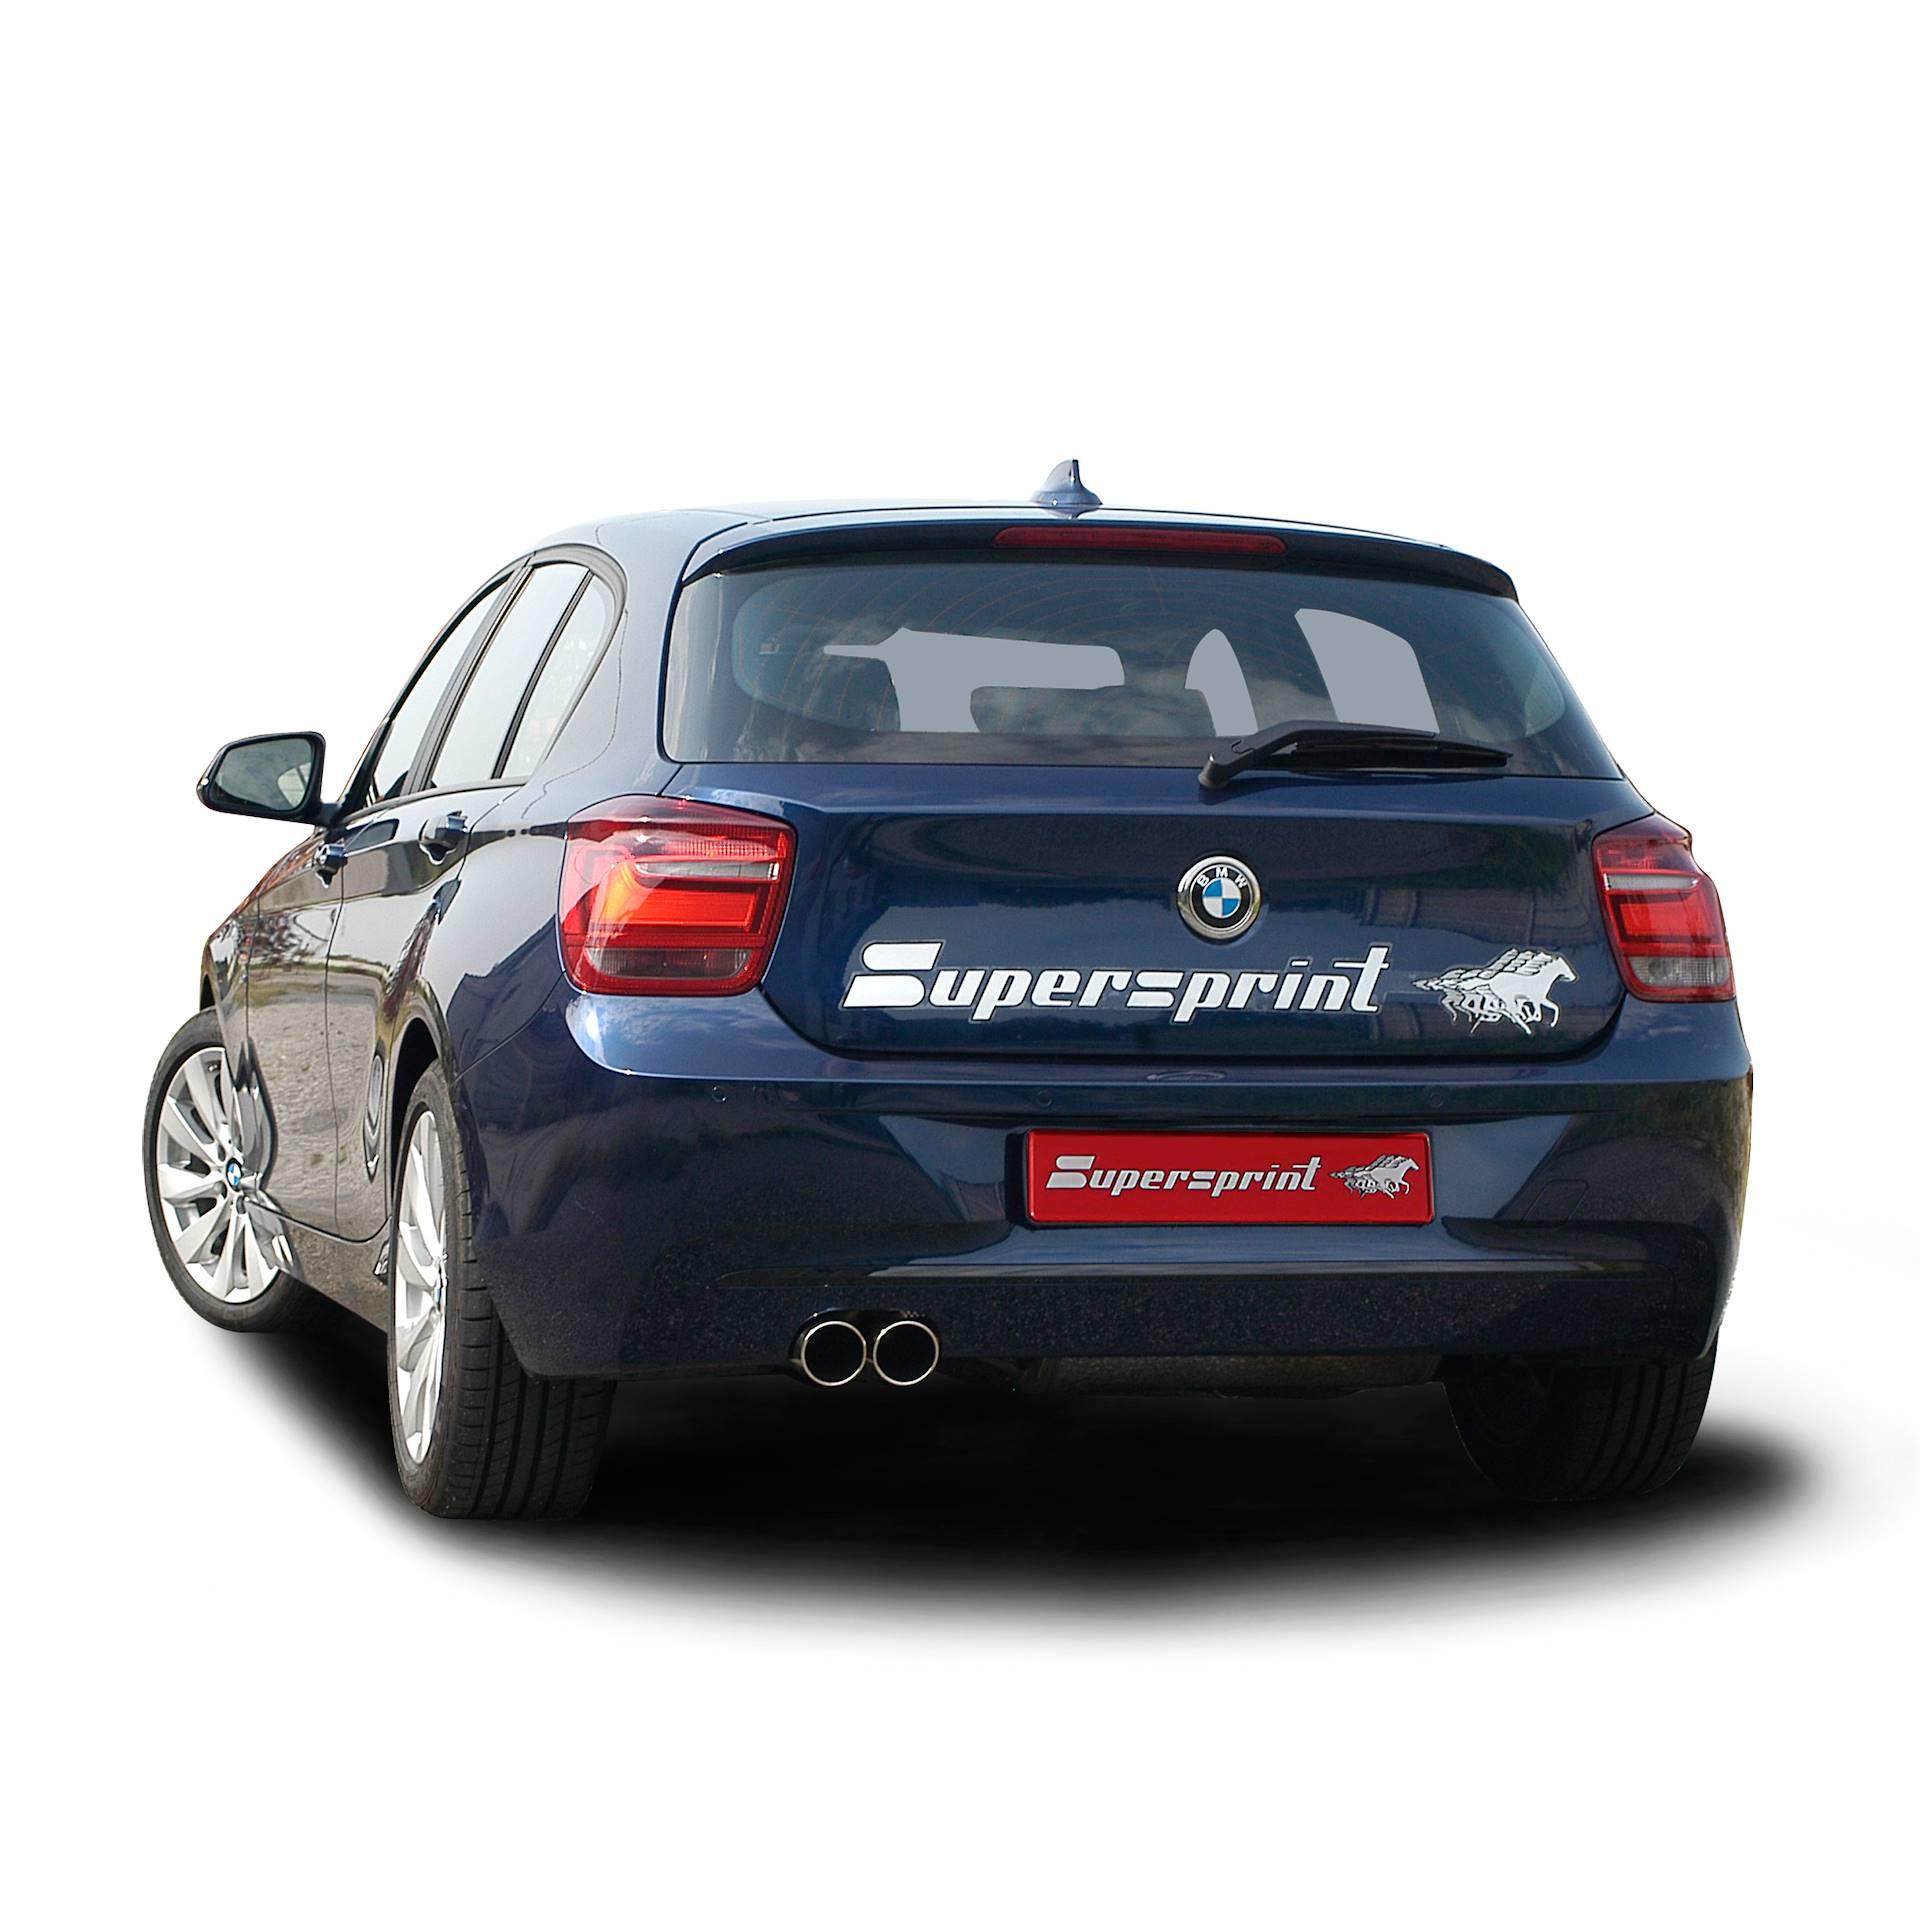 Bmw 125i: BMW F20 125i 2.0T (218 Hp) 2012 -> Impianto Di Scarico